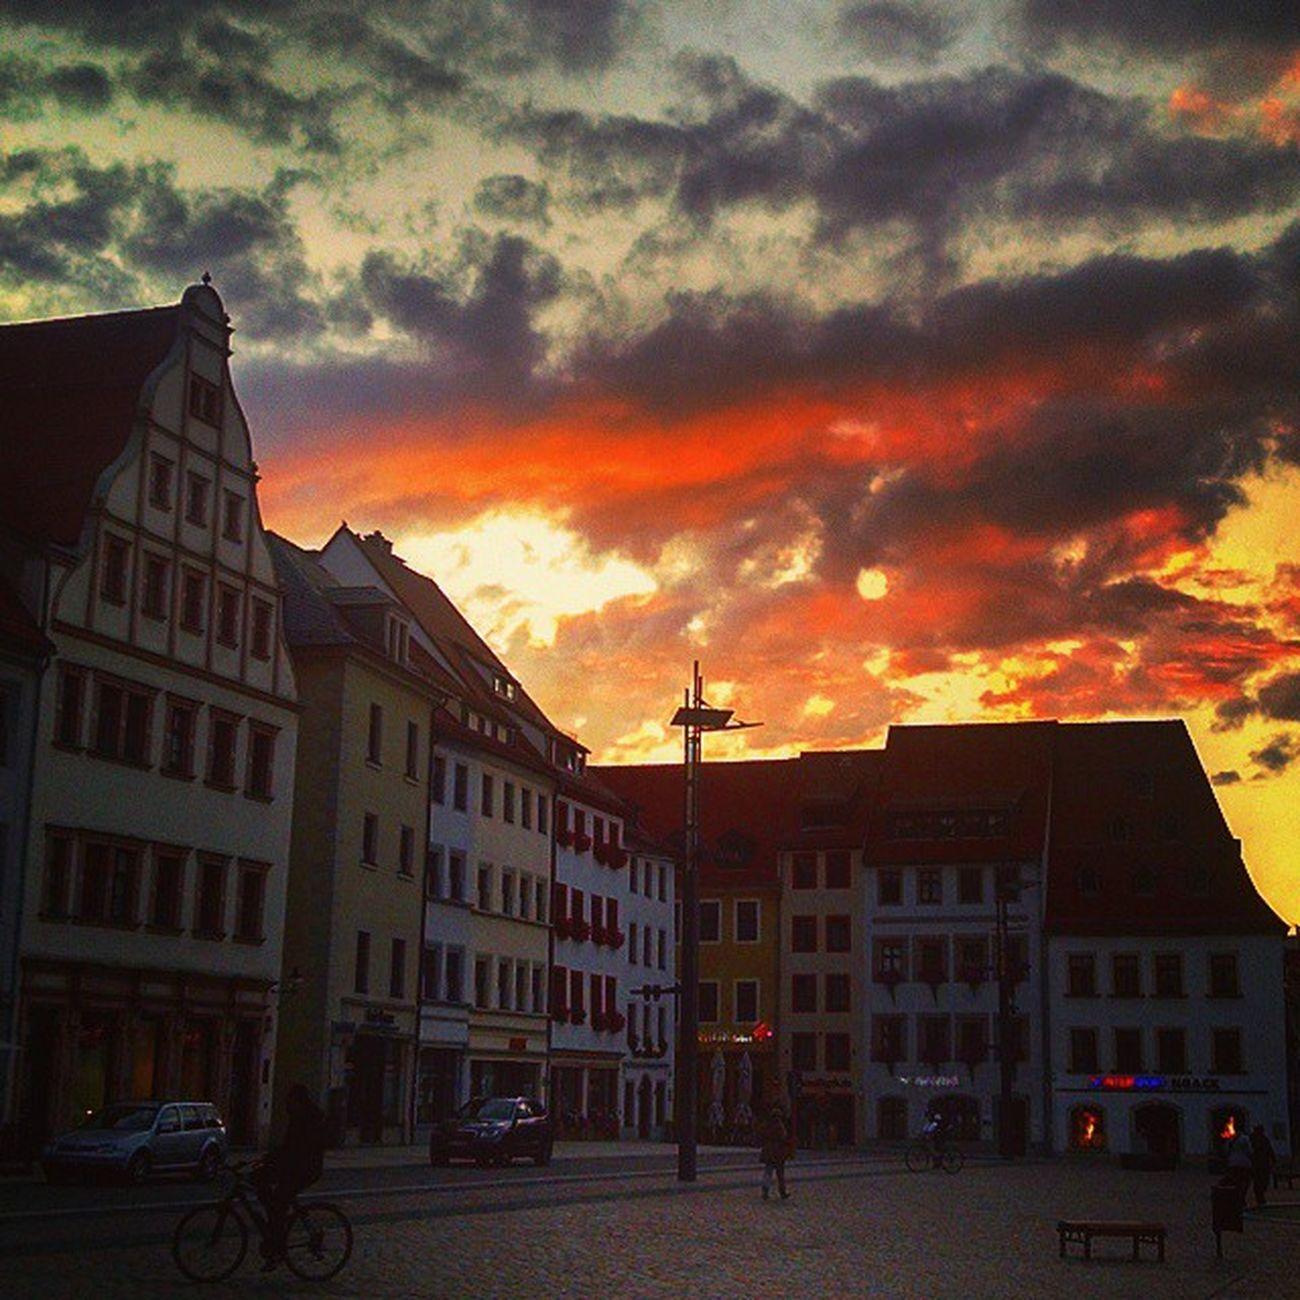 Sunset Freiberg Saxony Sachsen Ig_deutschland Ig_germany Ig_europe Insta_international Insta_europe Sunsetporn Sunlight Eastgermany